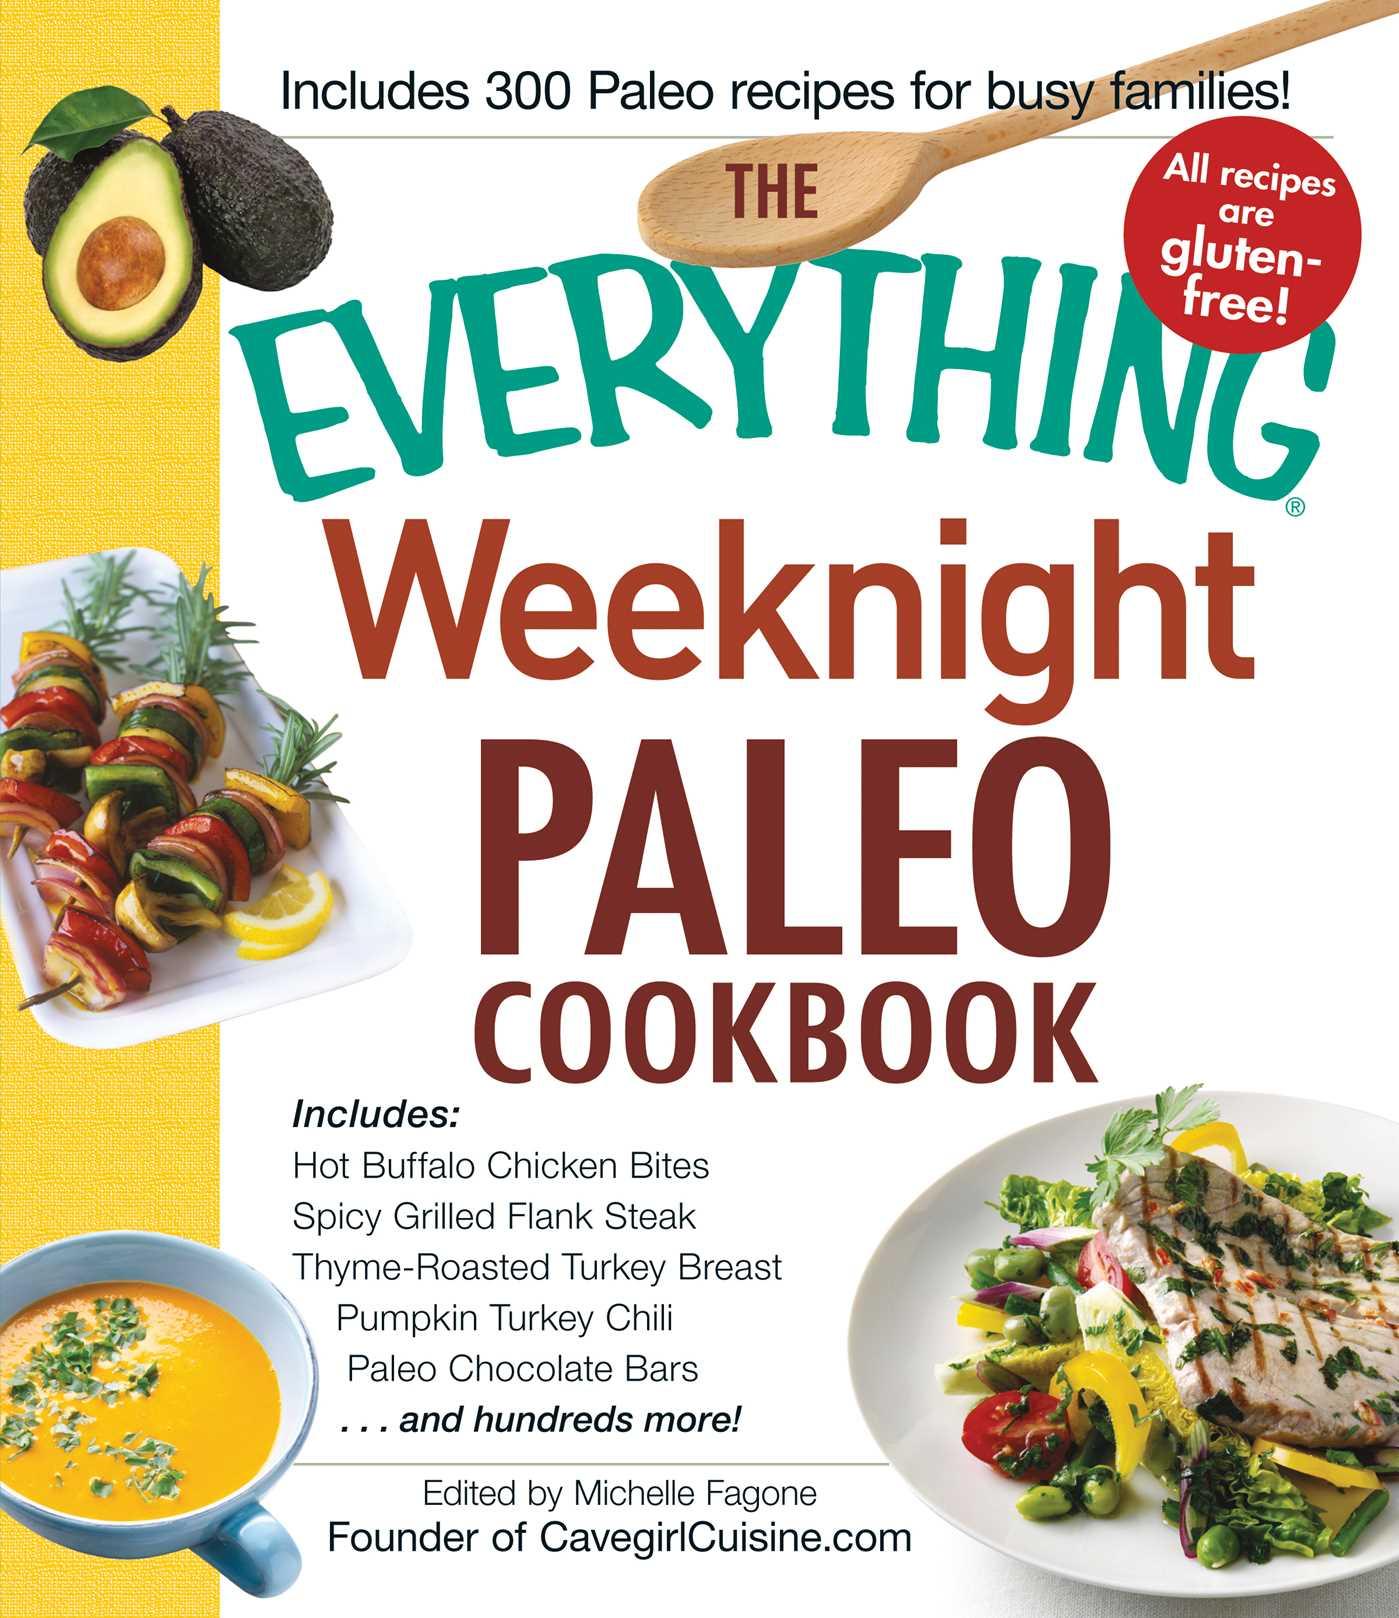 The everything weeknight paleo cookbook 9781440572296 hr